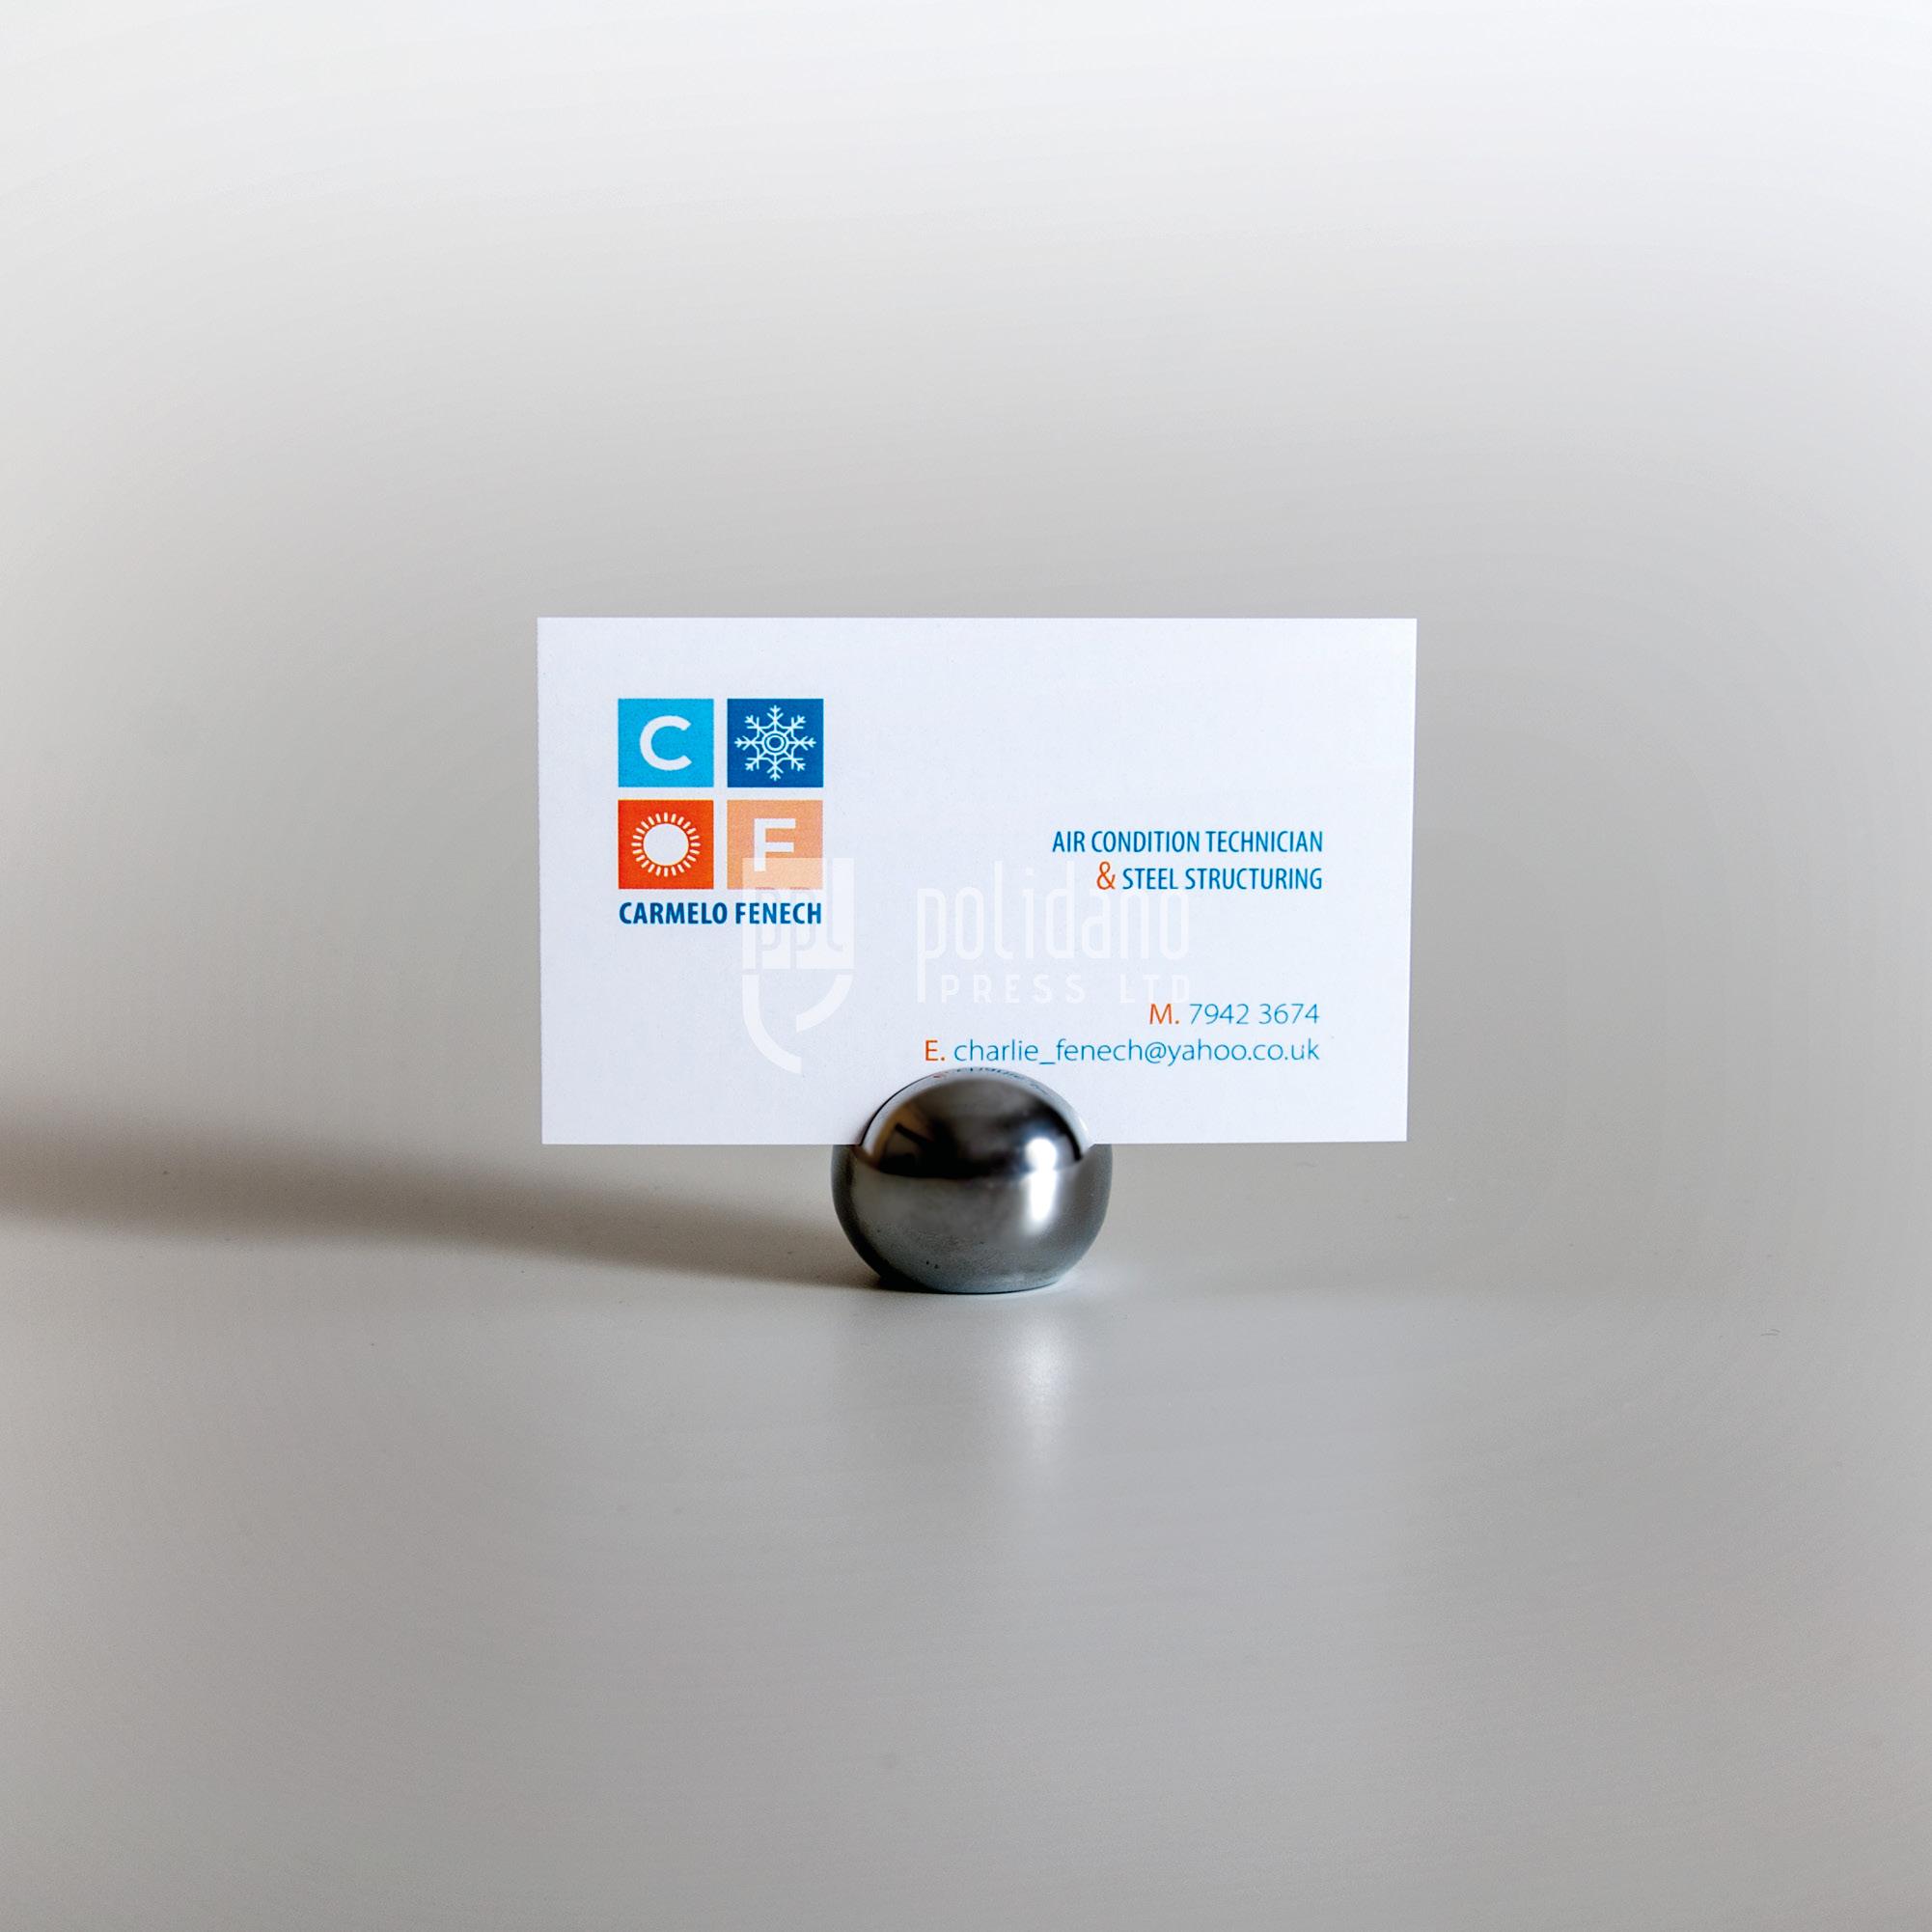 Carmelo Fenech business cards